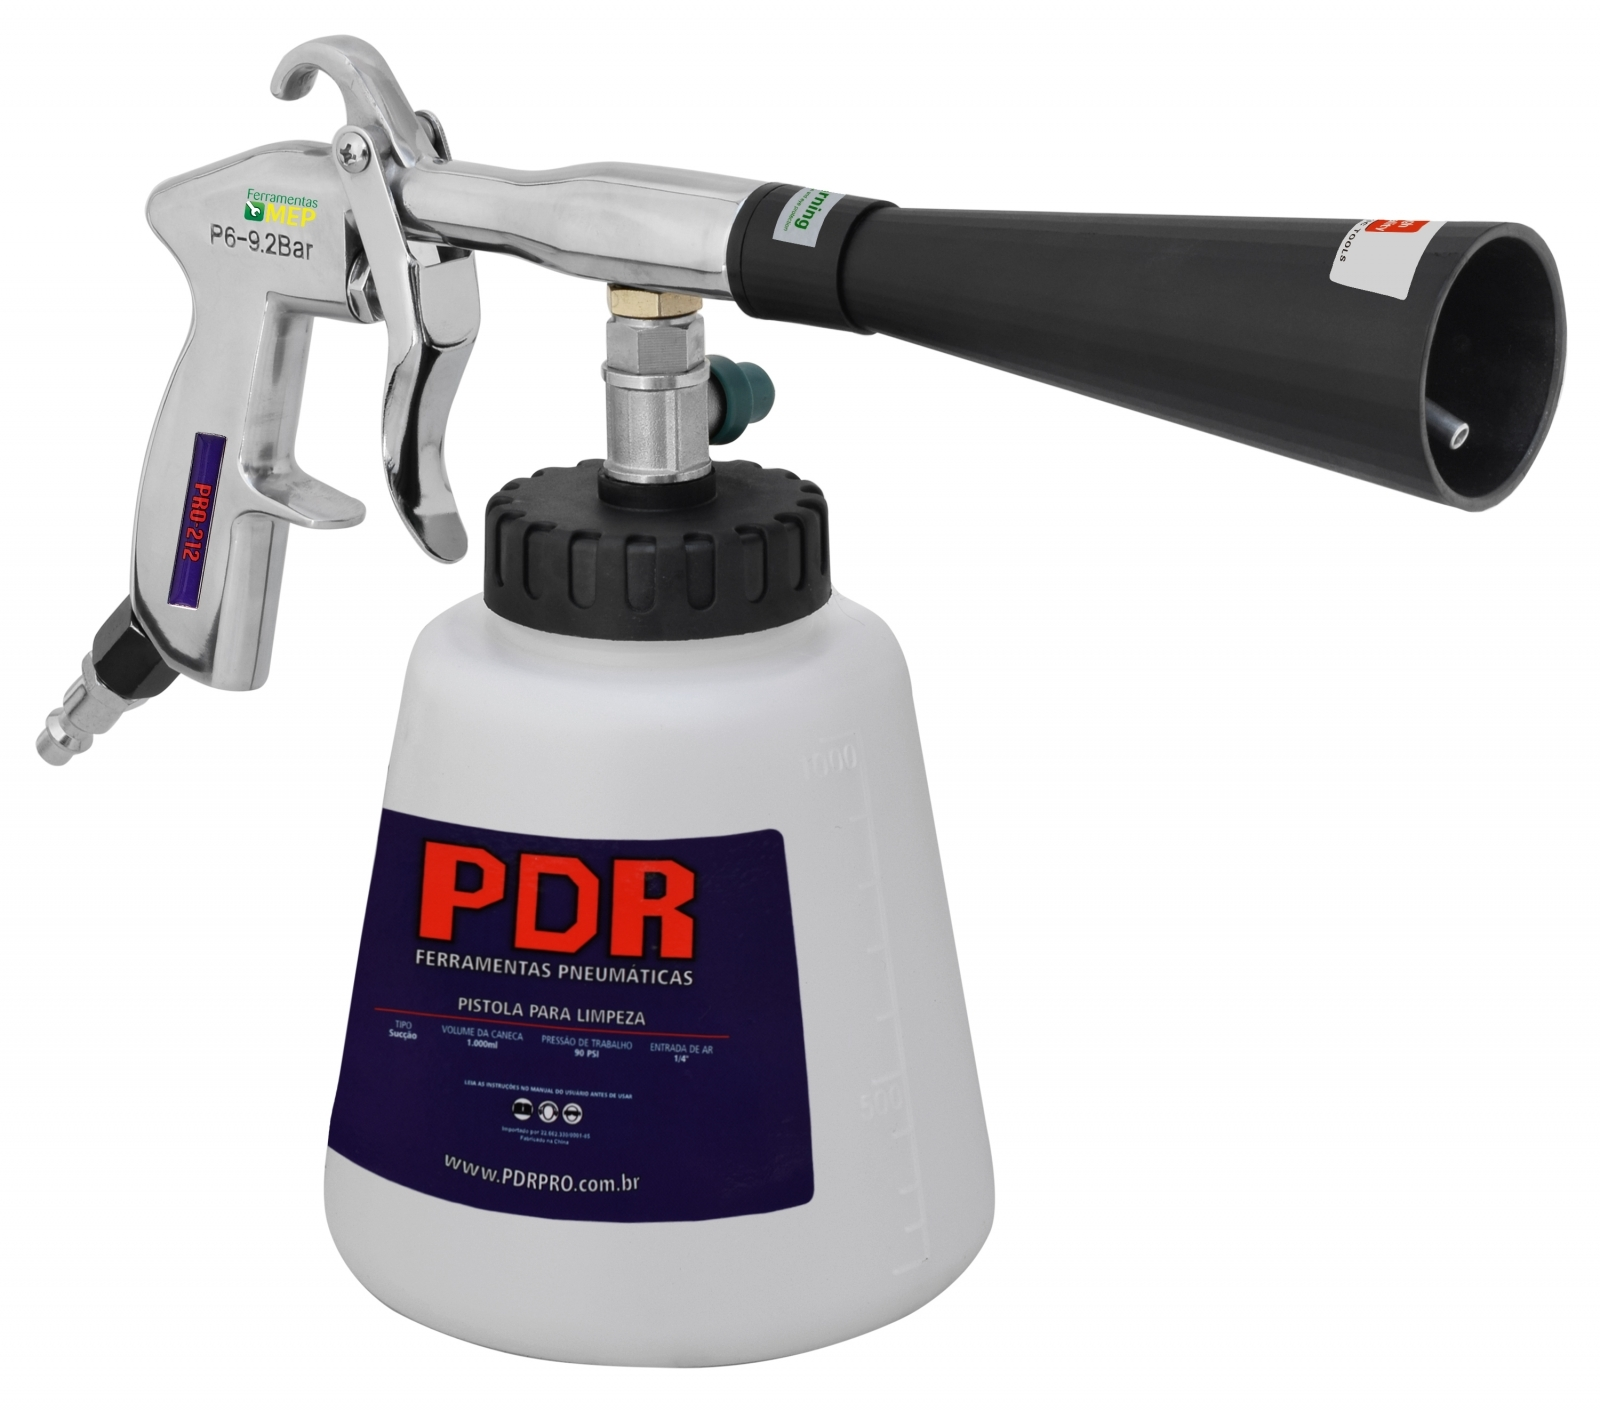 Tornador De Limpeza Profissional PDR Pro-212 Pt2 - Ferramentas MEP